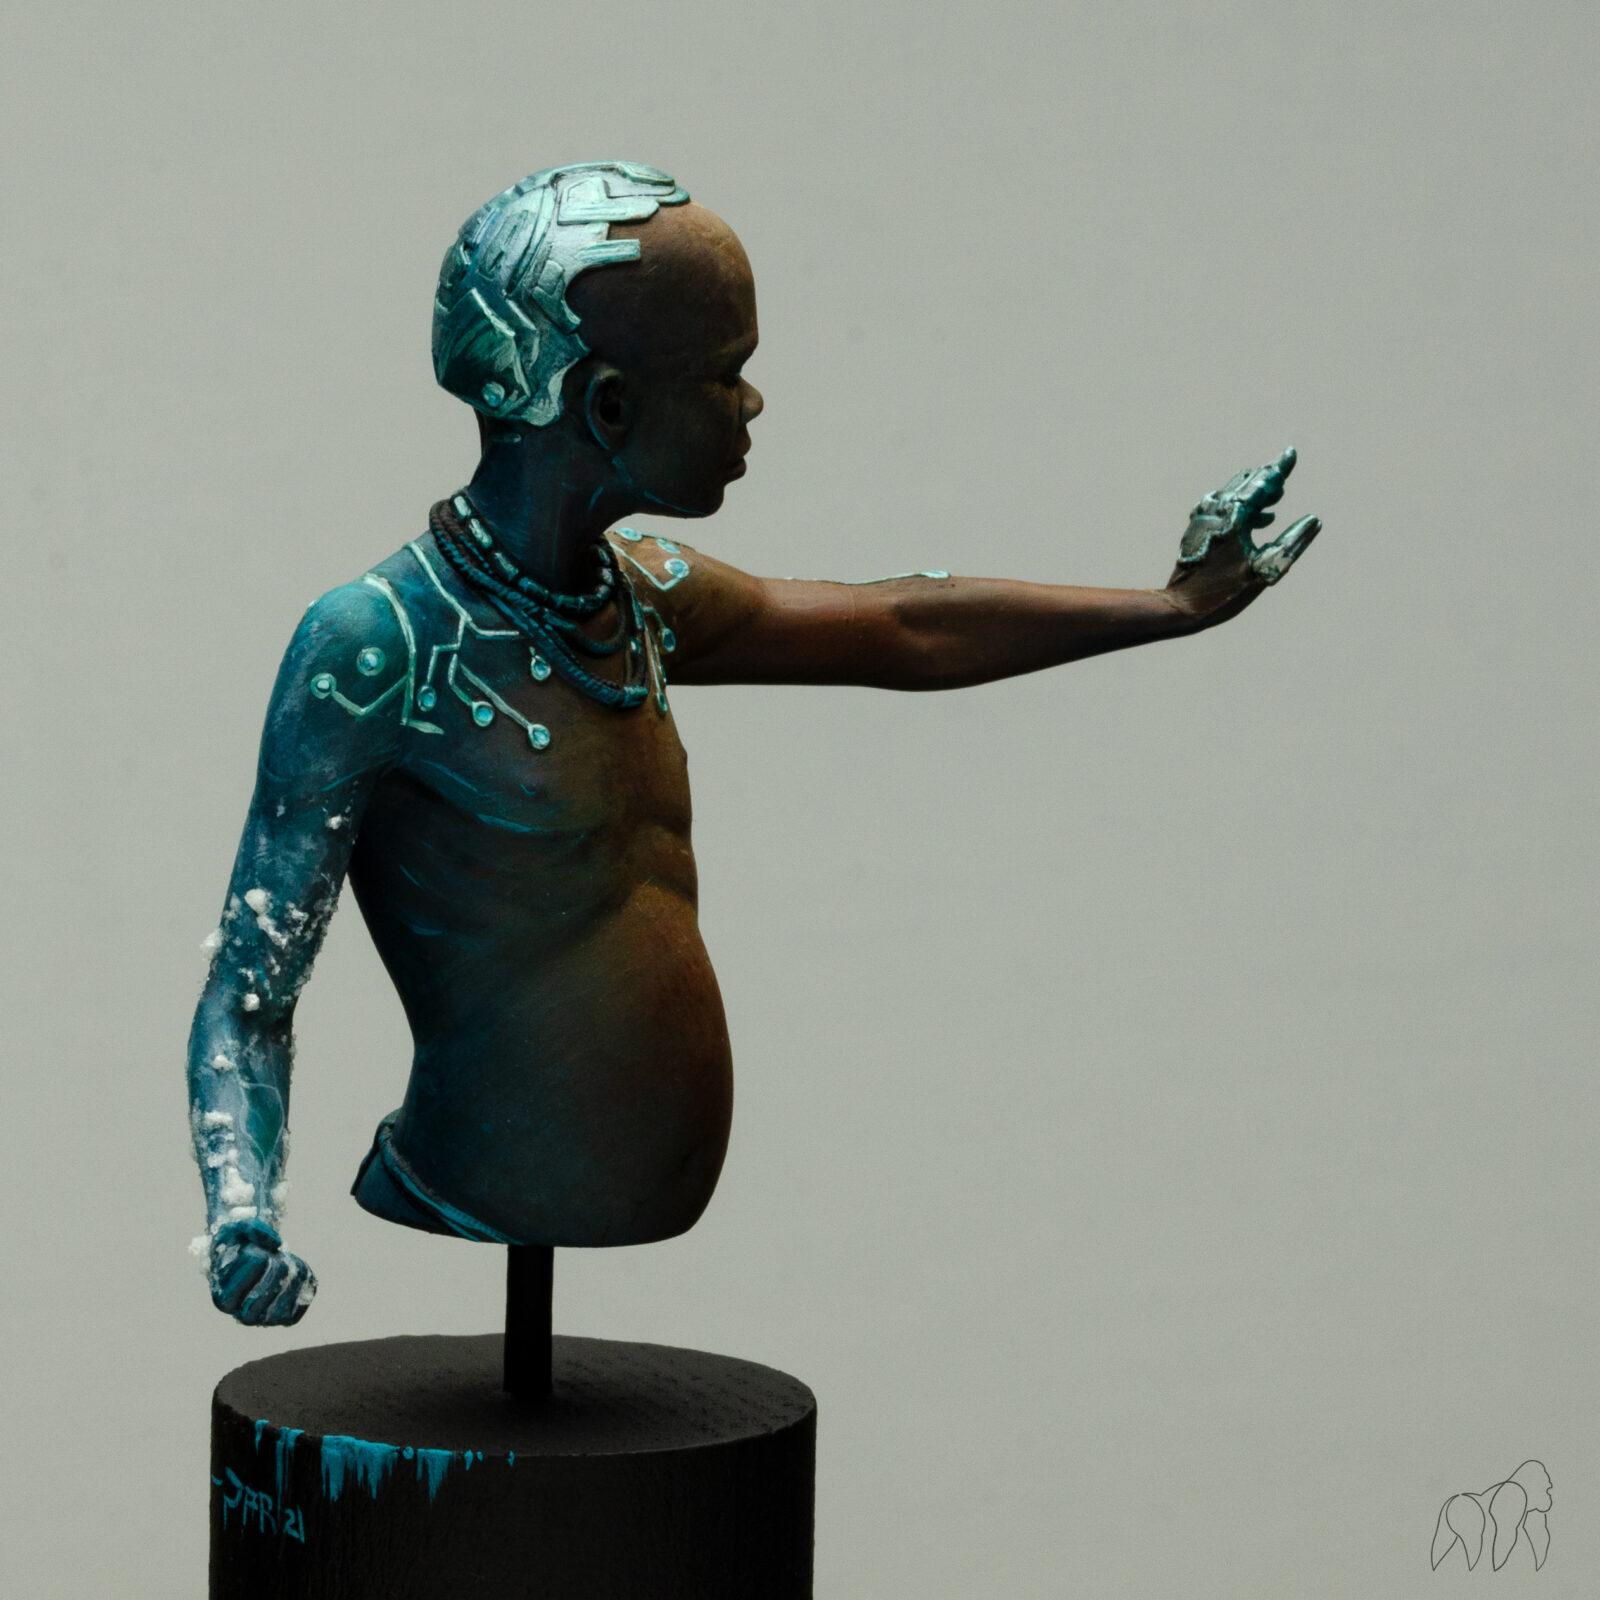 Iceboy12